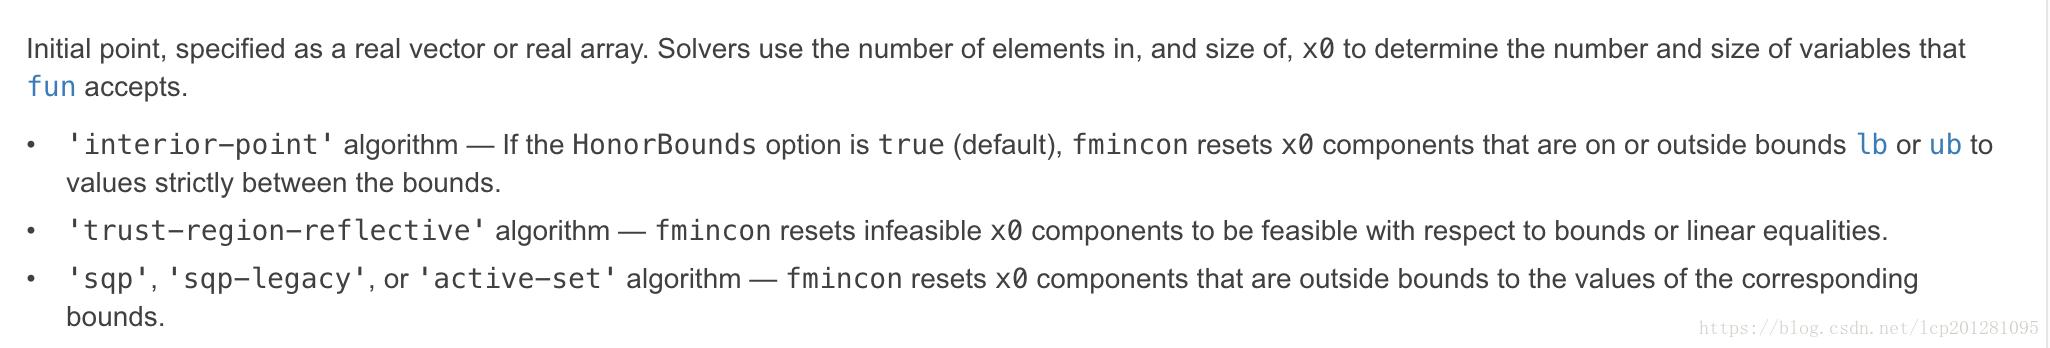 MATLAB fmincon 的初值x0的選取問題- 台部落